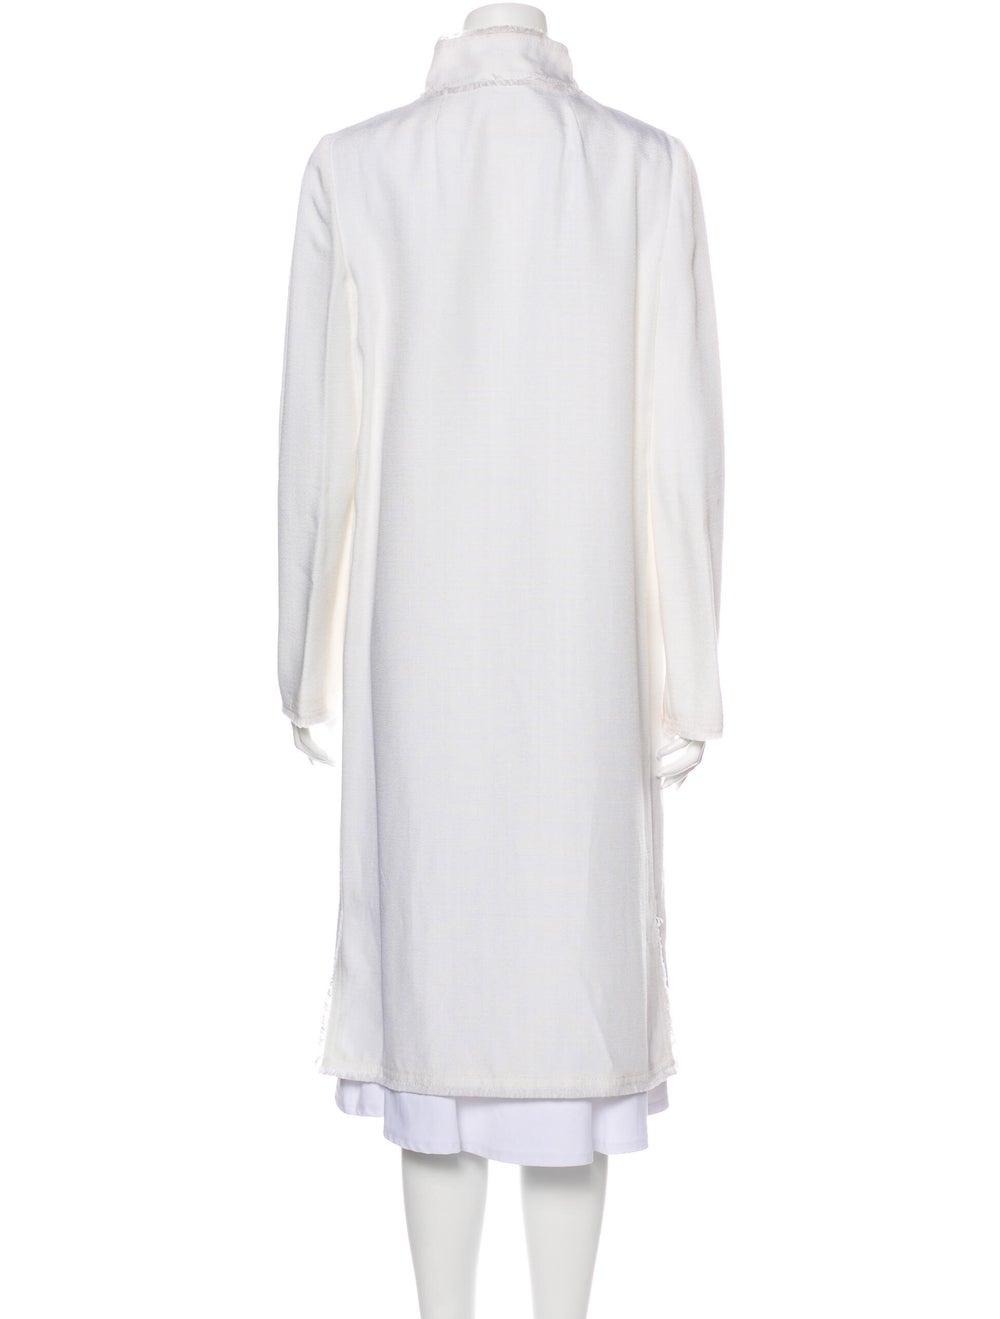 Dolce & Gabbana Coat - image 3